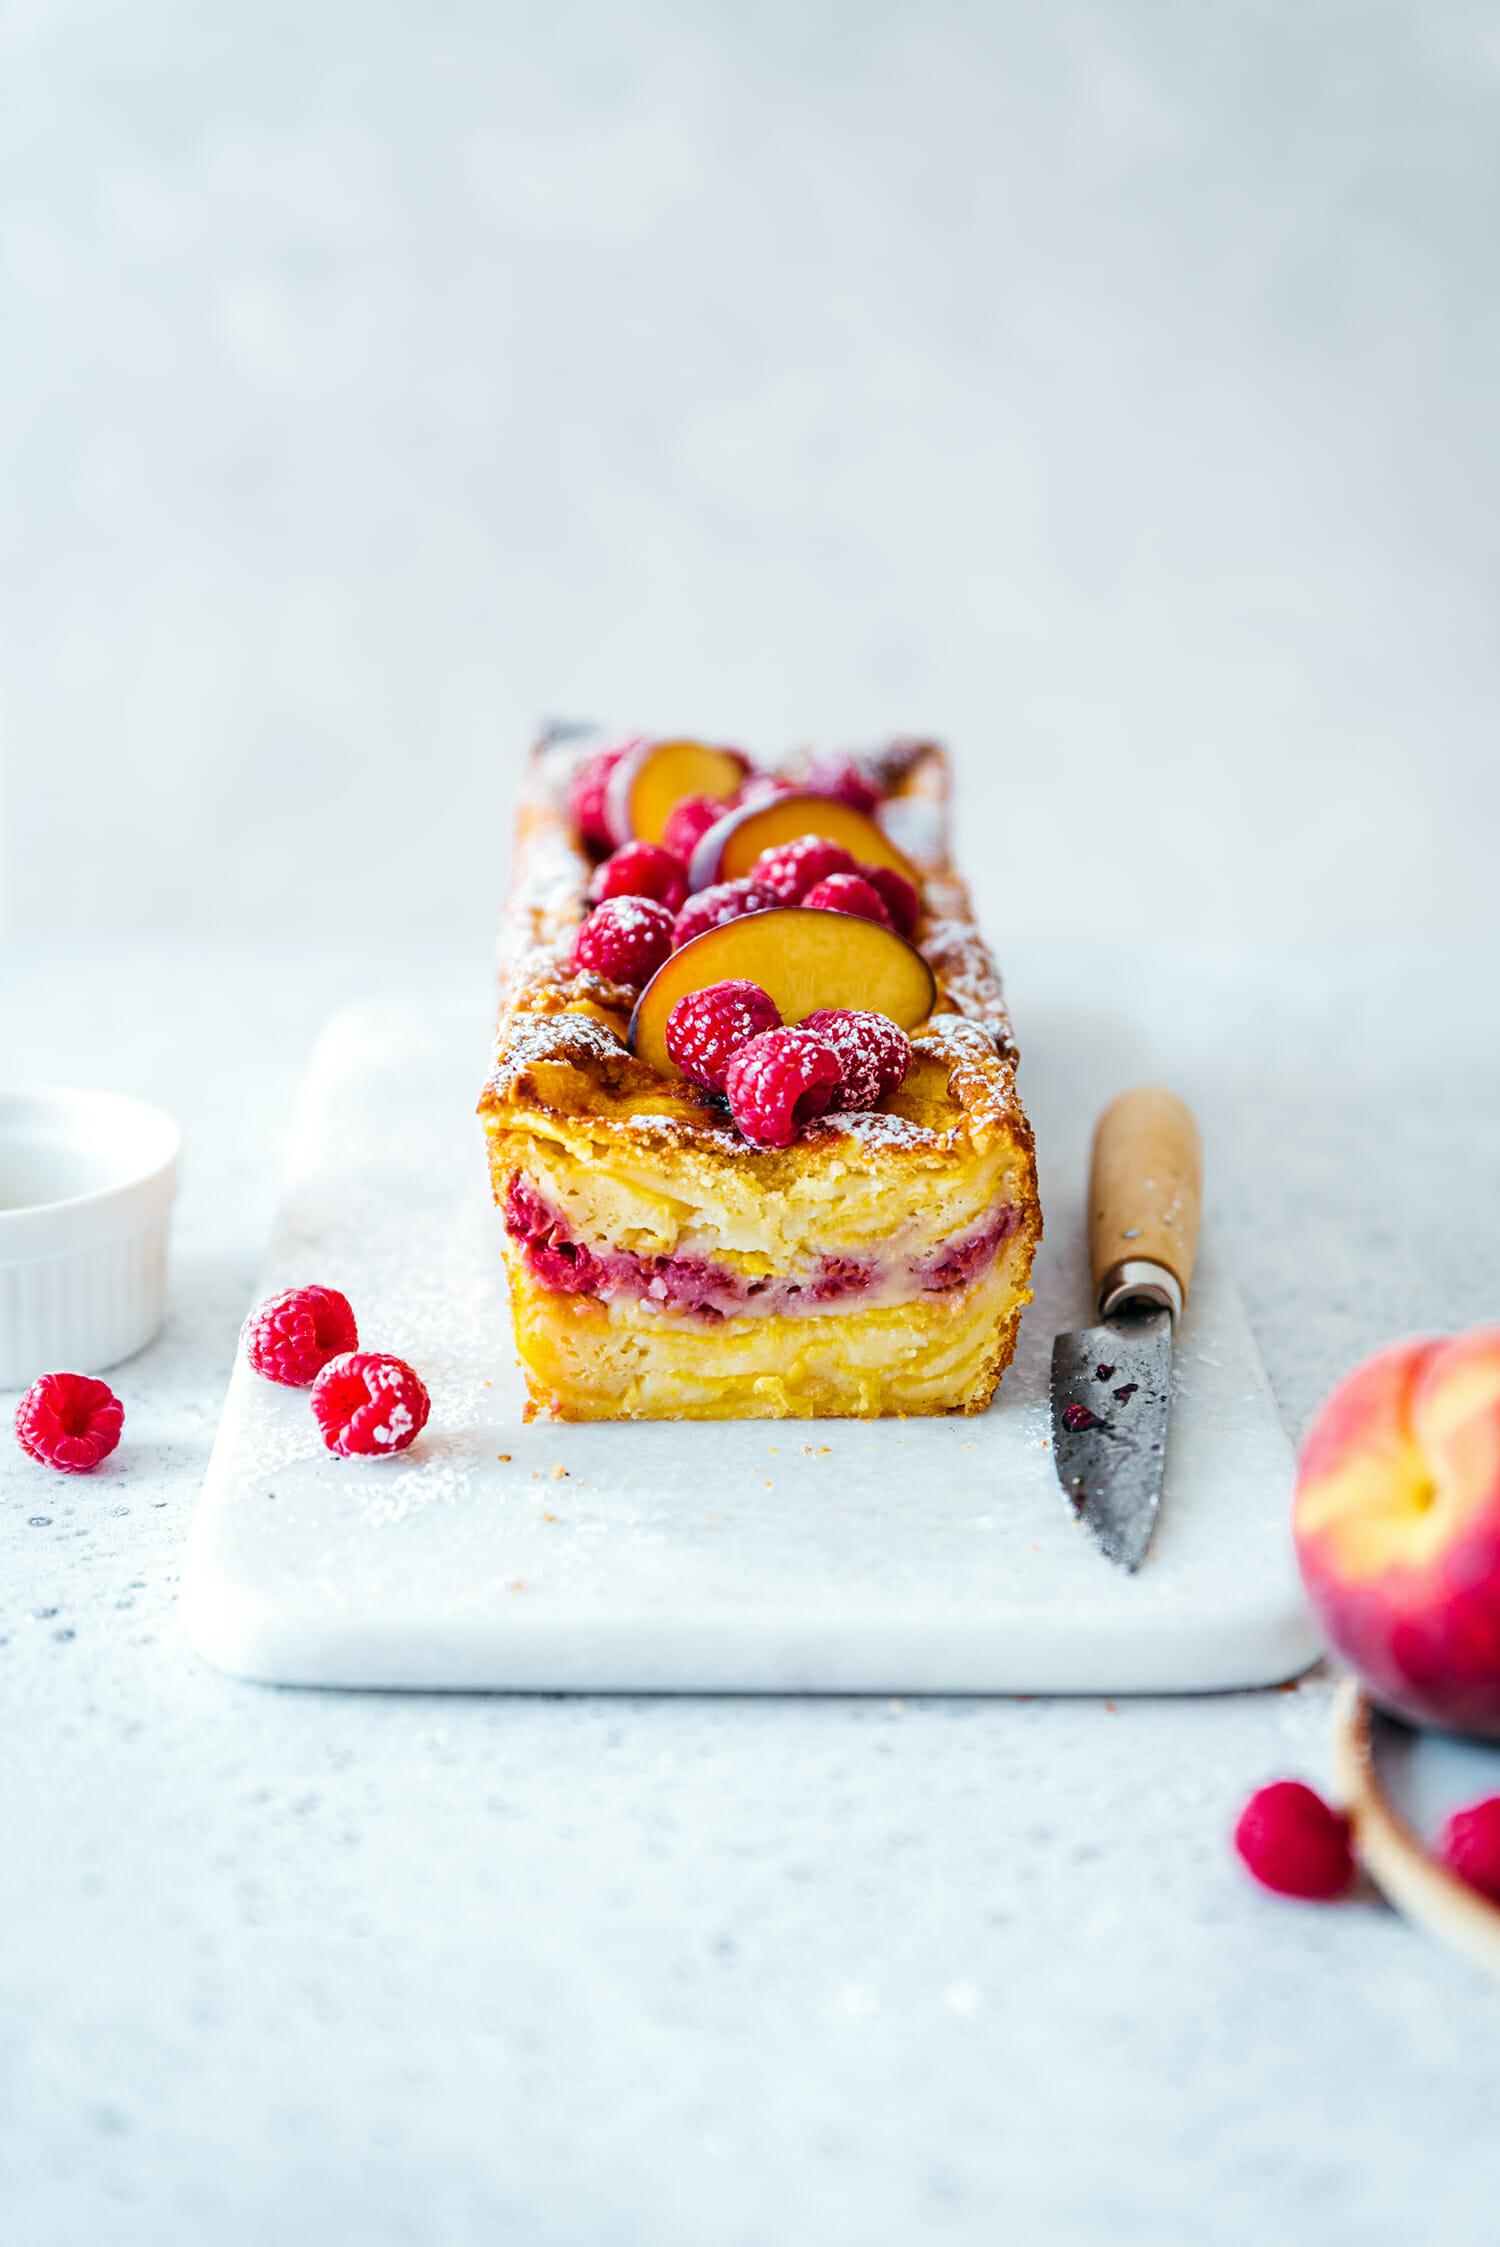 Cake fondant pêches framboise fève tonka - Lilie Bakery